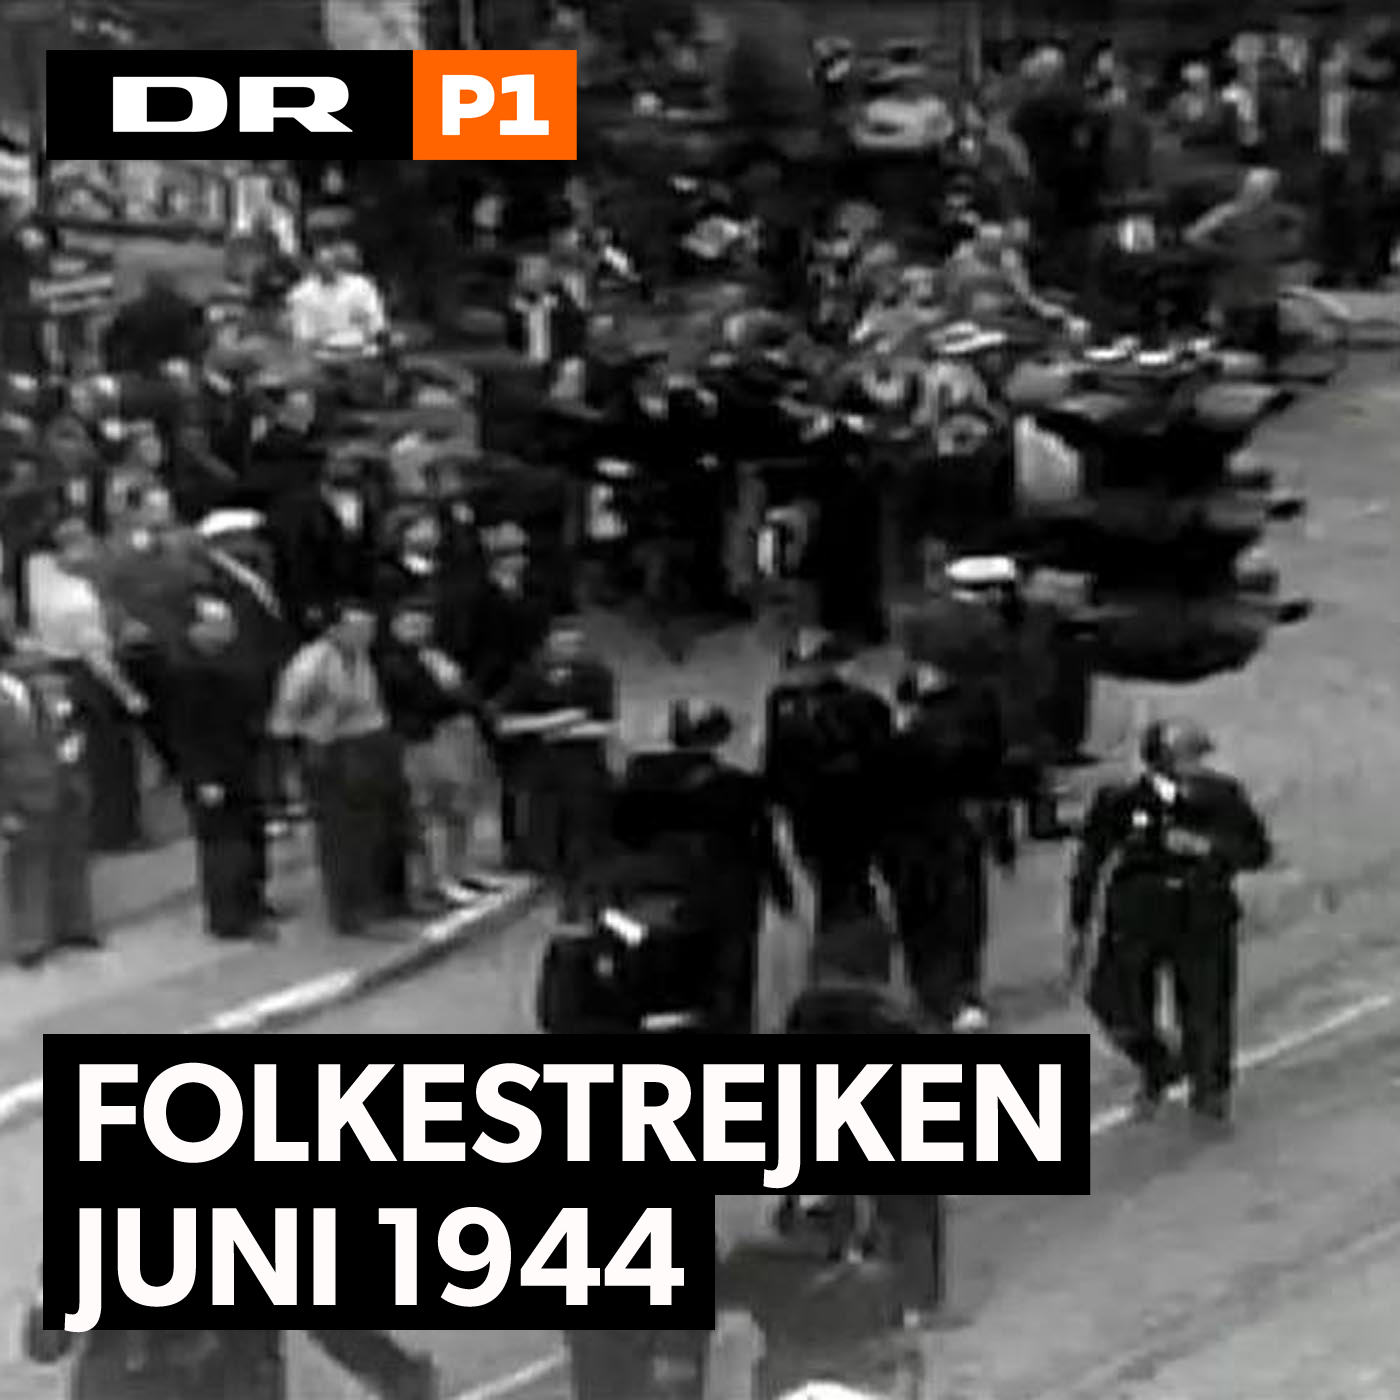 Folkestrejken juni 1944